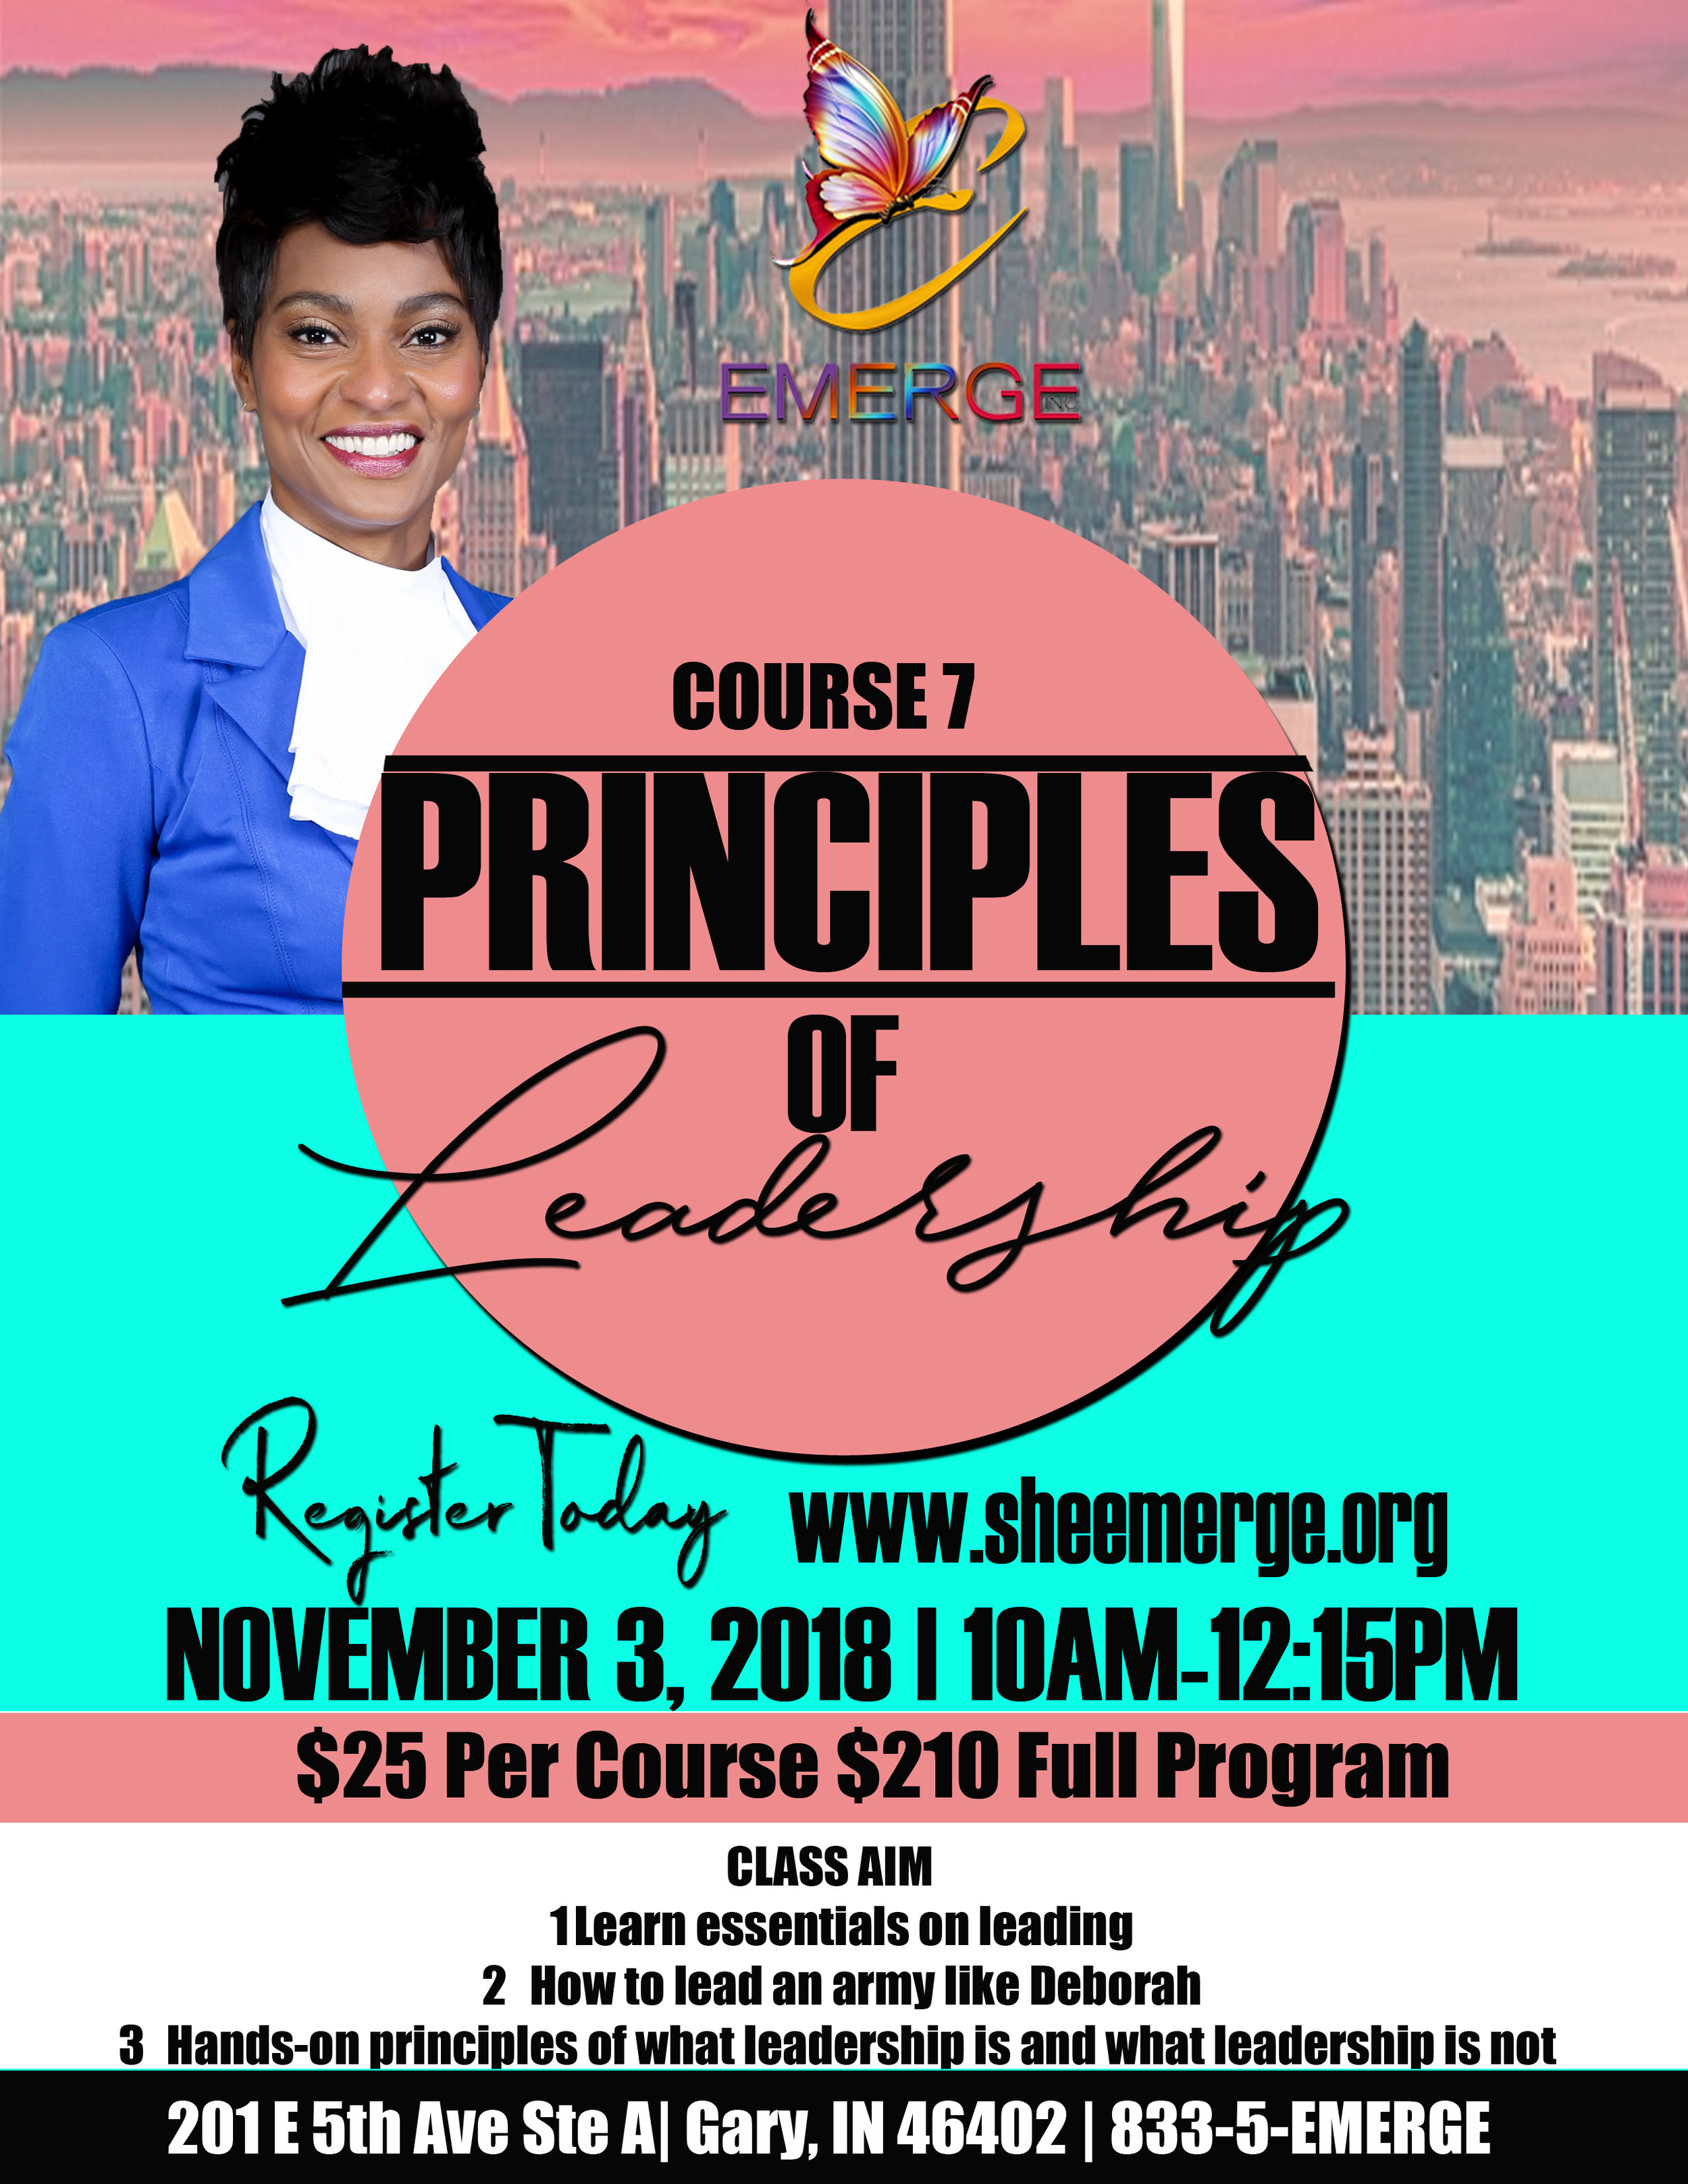 Course 7: Principles of Leadership - Session Start Date: November 3, 2018Course Description: Preparation and DisciplinePresenter: Pastor LashawnTime: 10:00am-12:15pmLocation: 201 E. 5th Ave Ste D